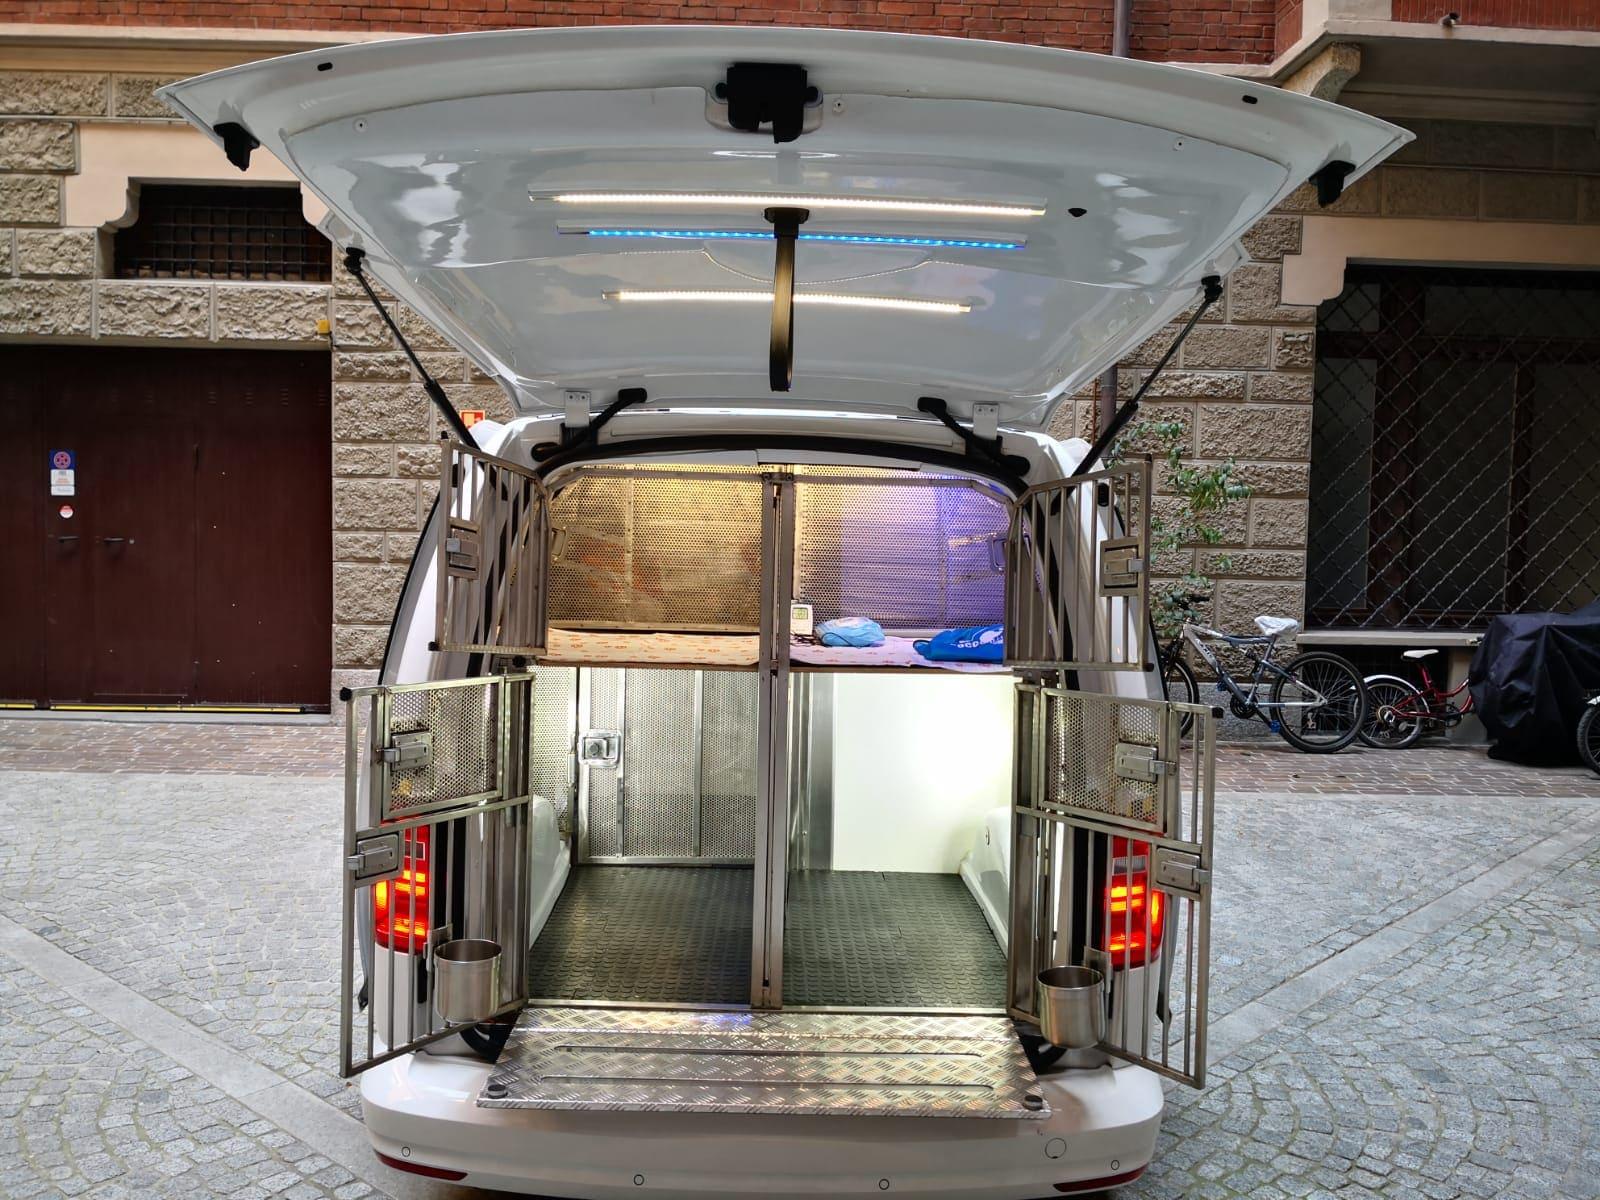 furgone-trasporto-animali-retro-illuminato